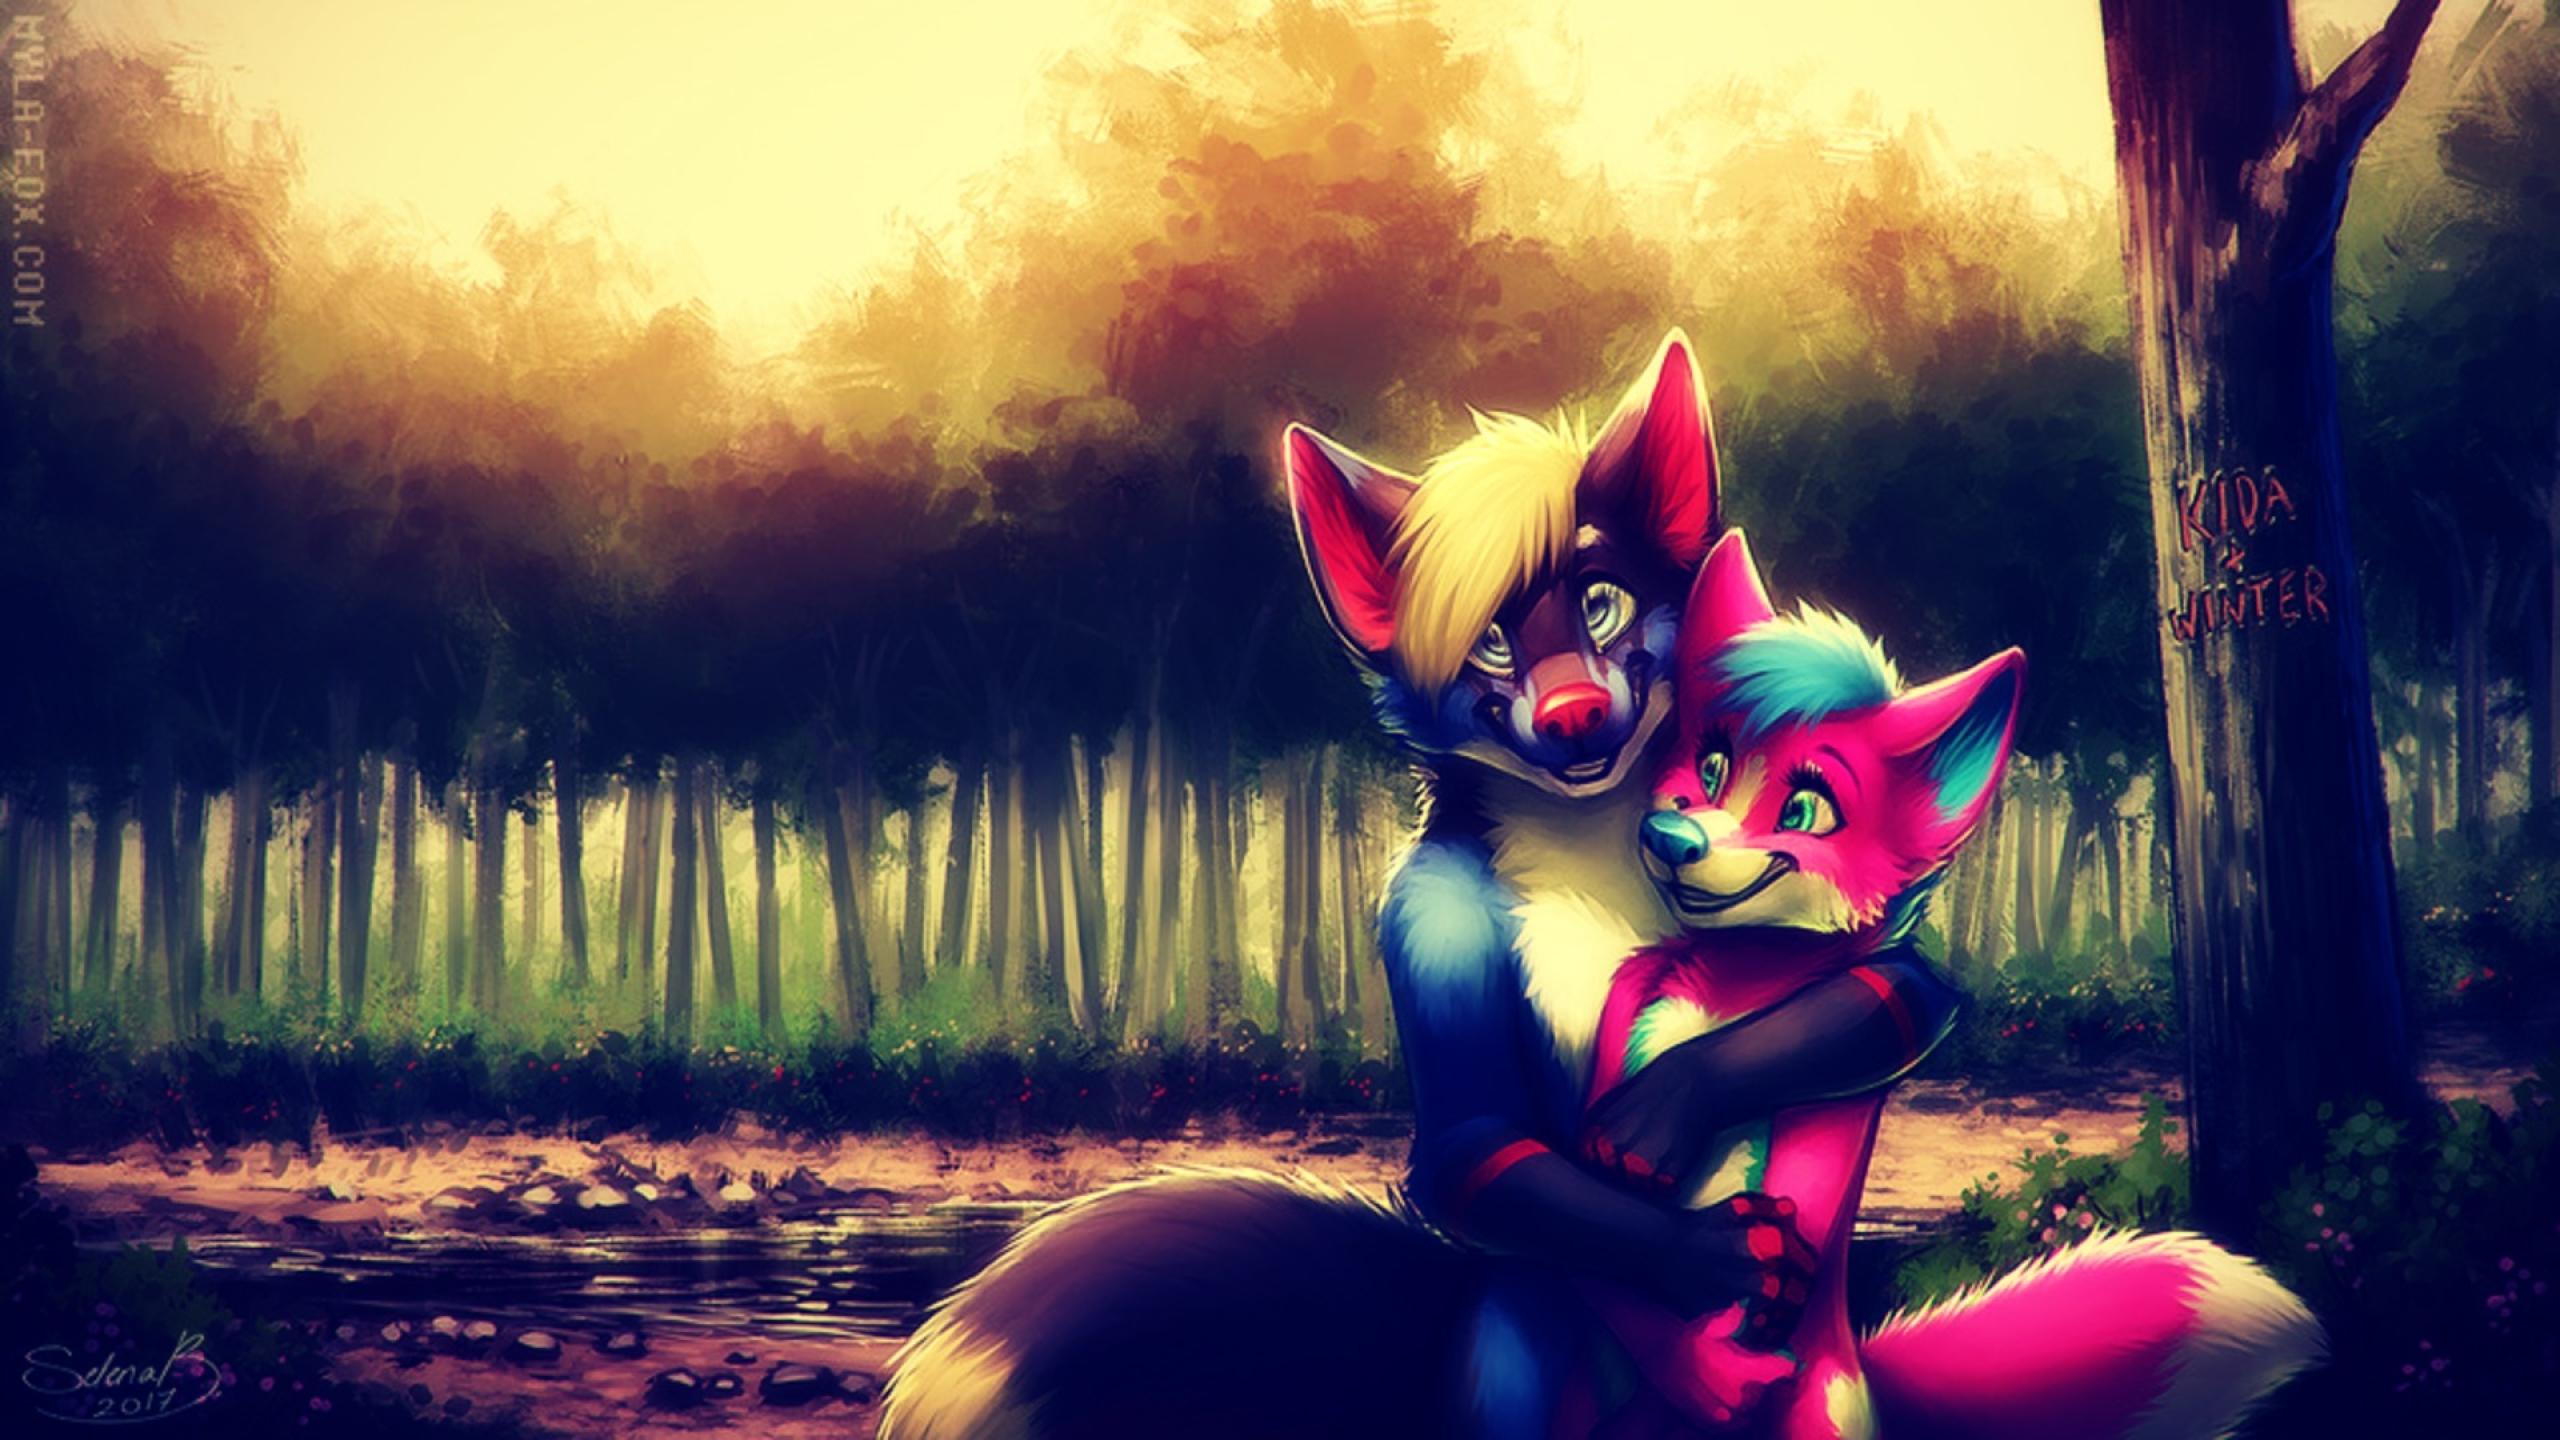 Furry Couple Anime Art, Full HD Wallpaper